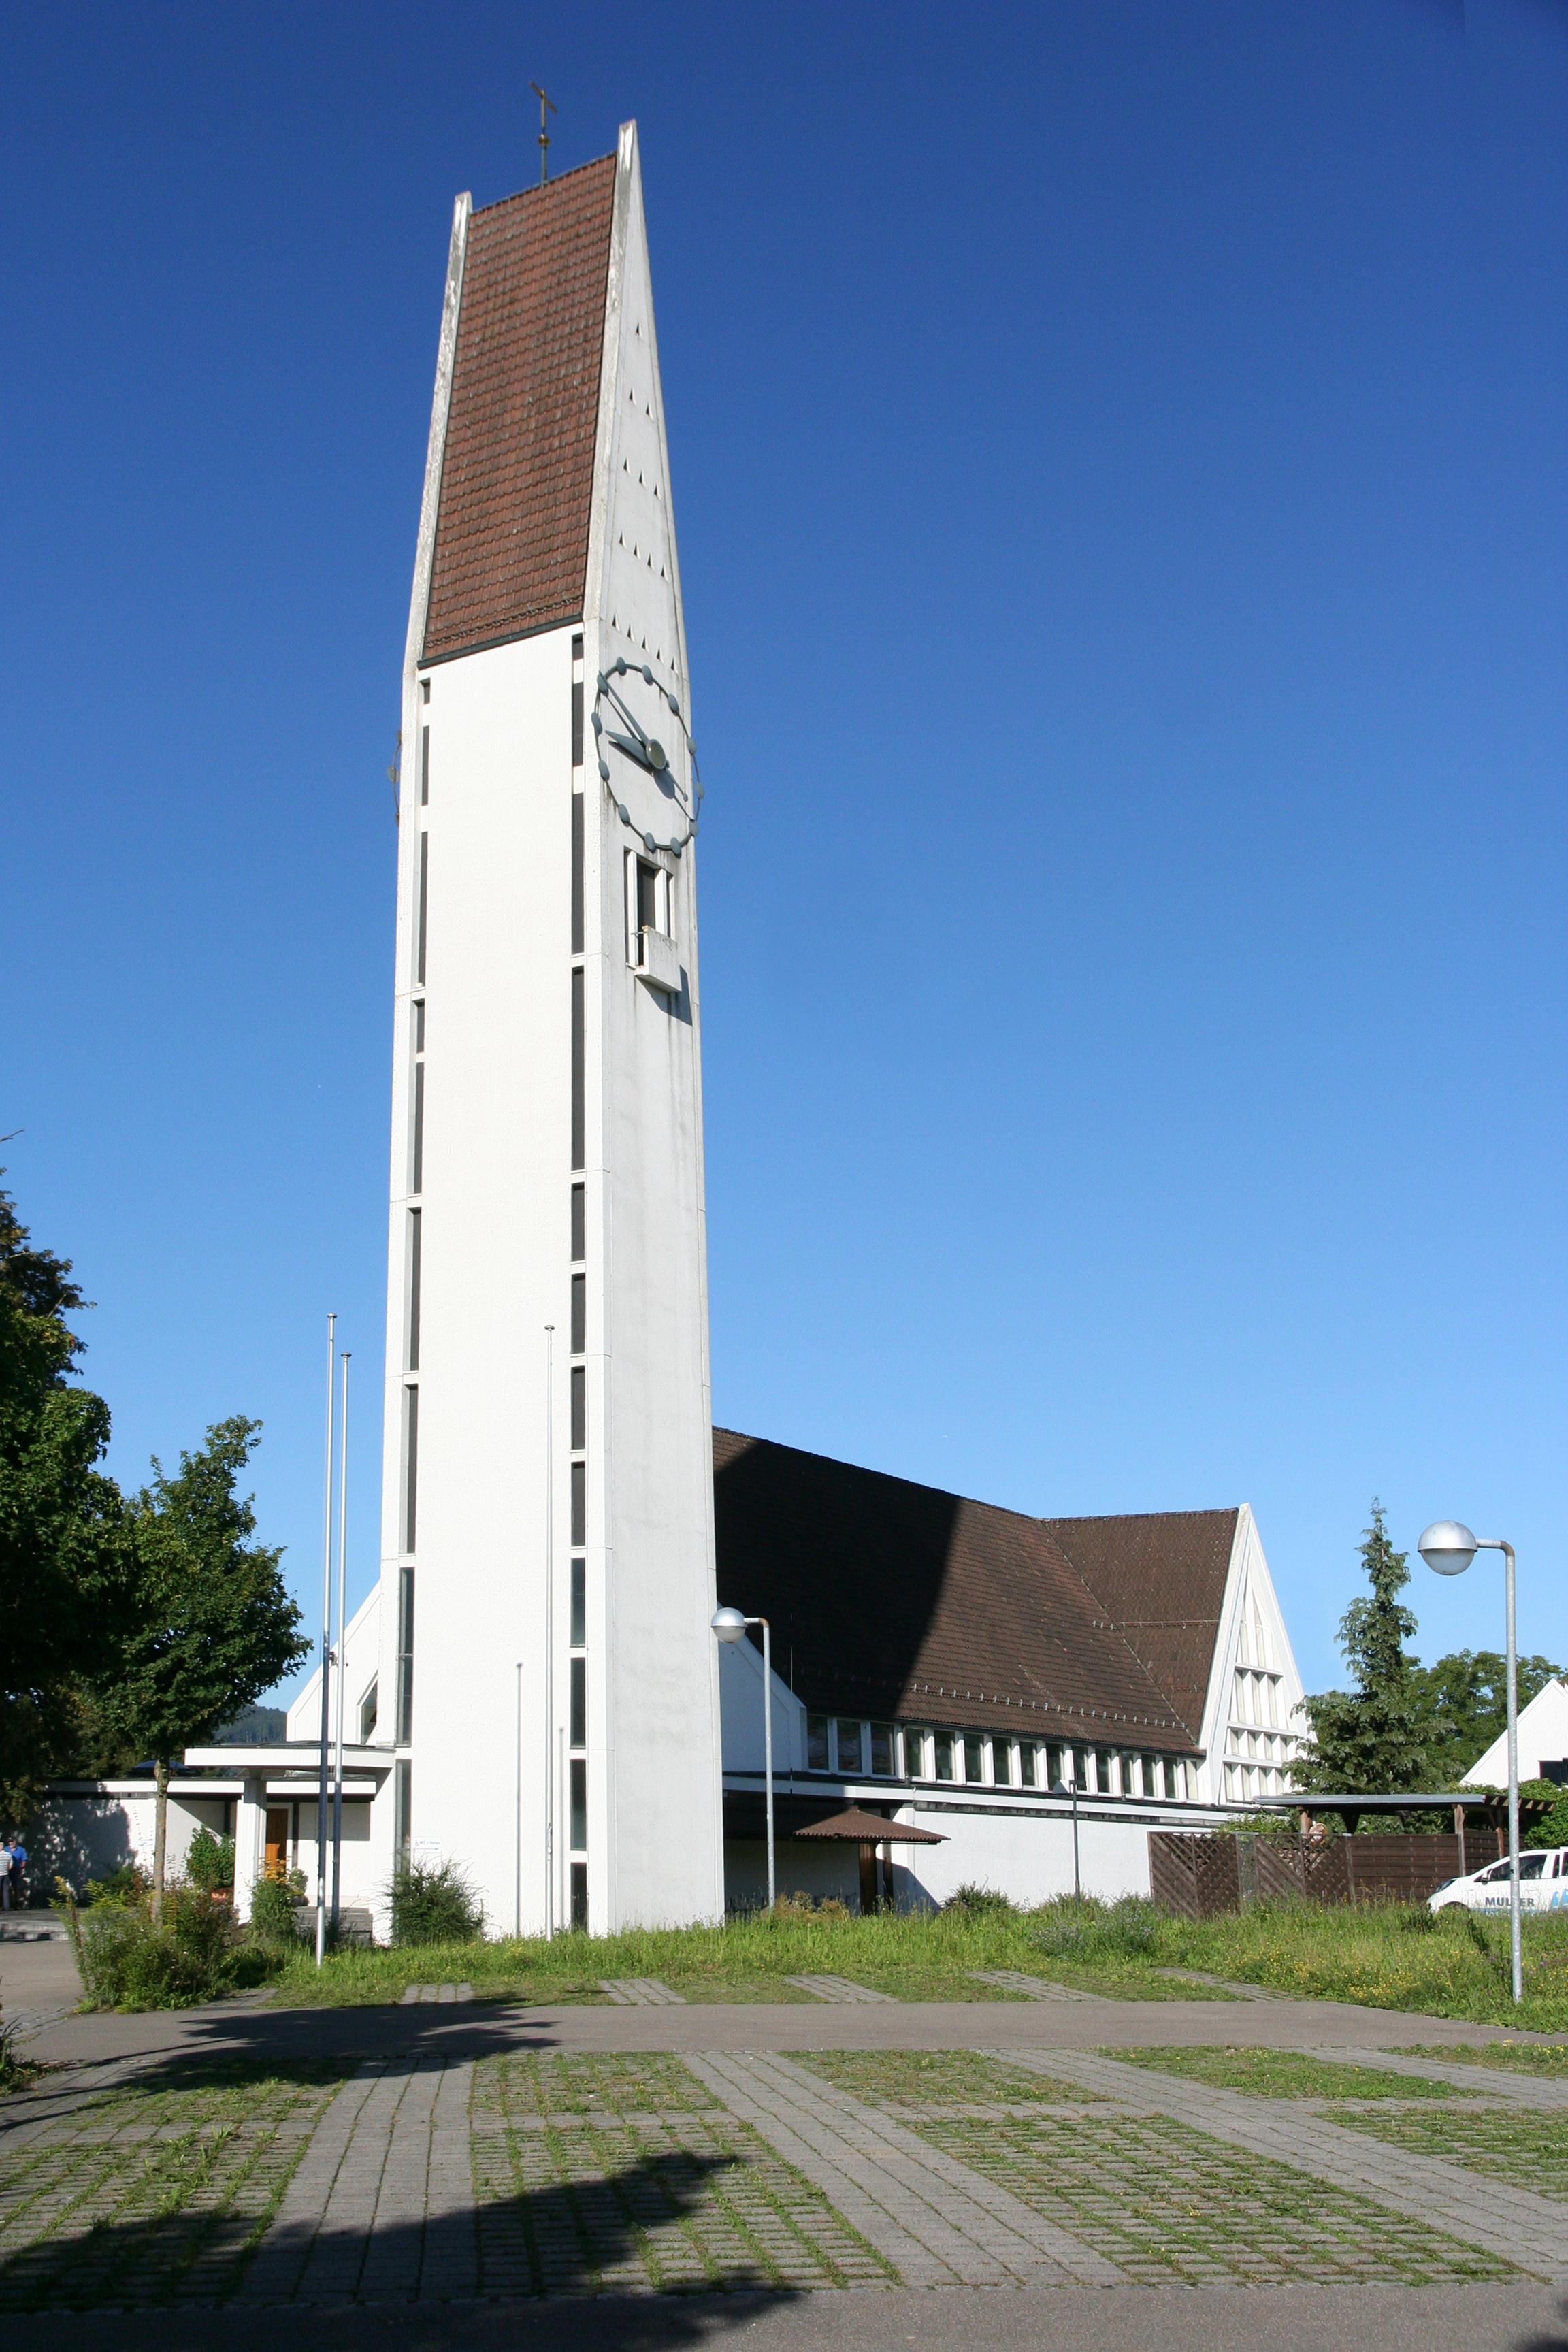 Katholische kirche frauenfeld oberkirch